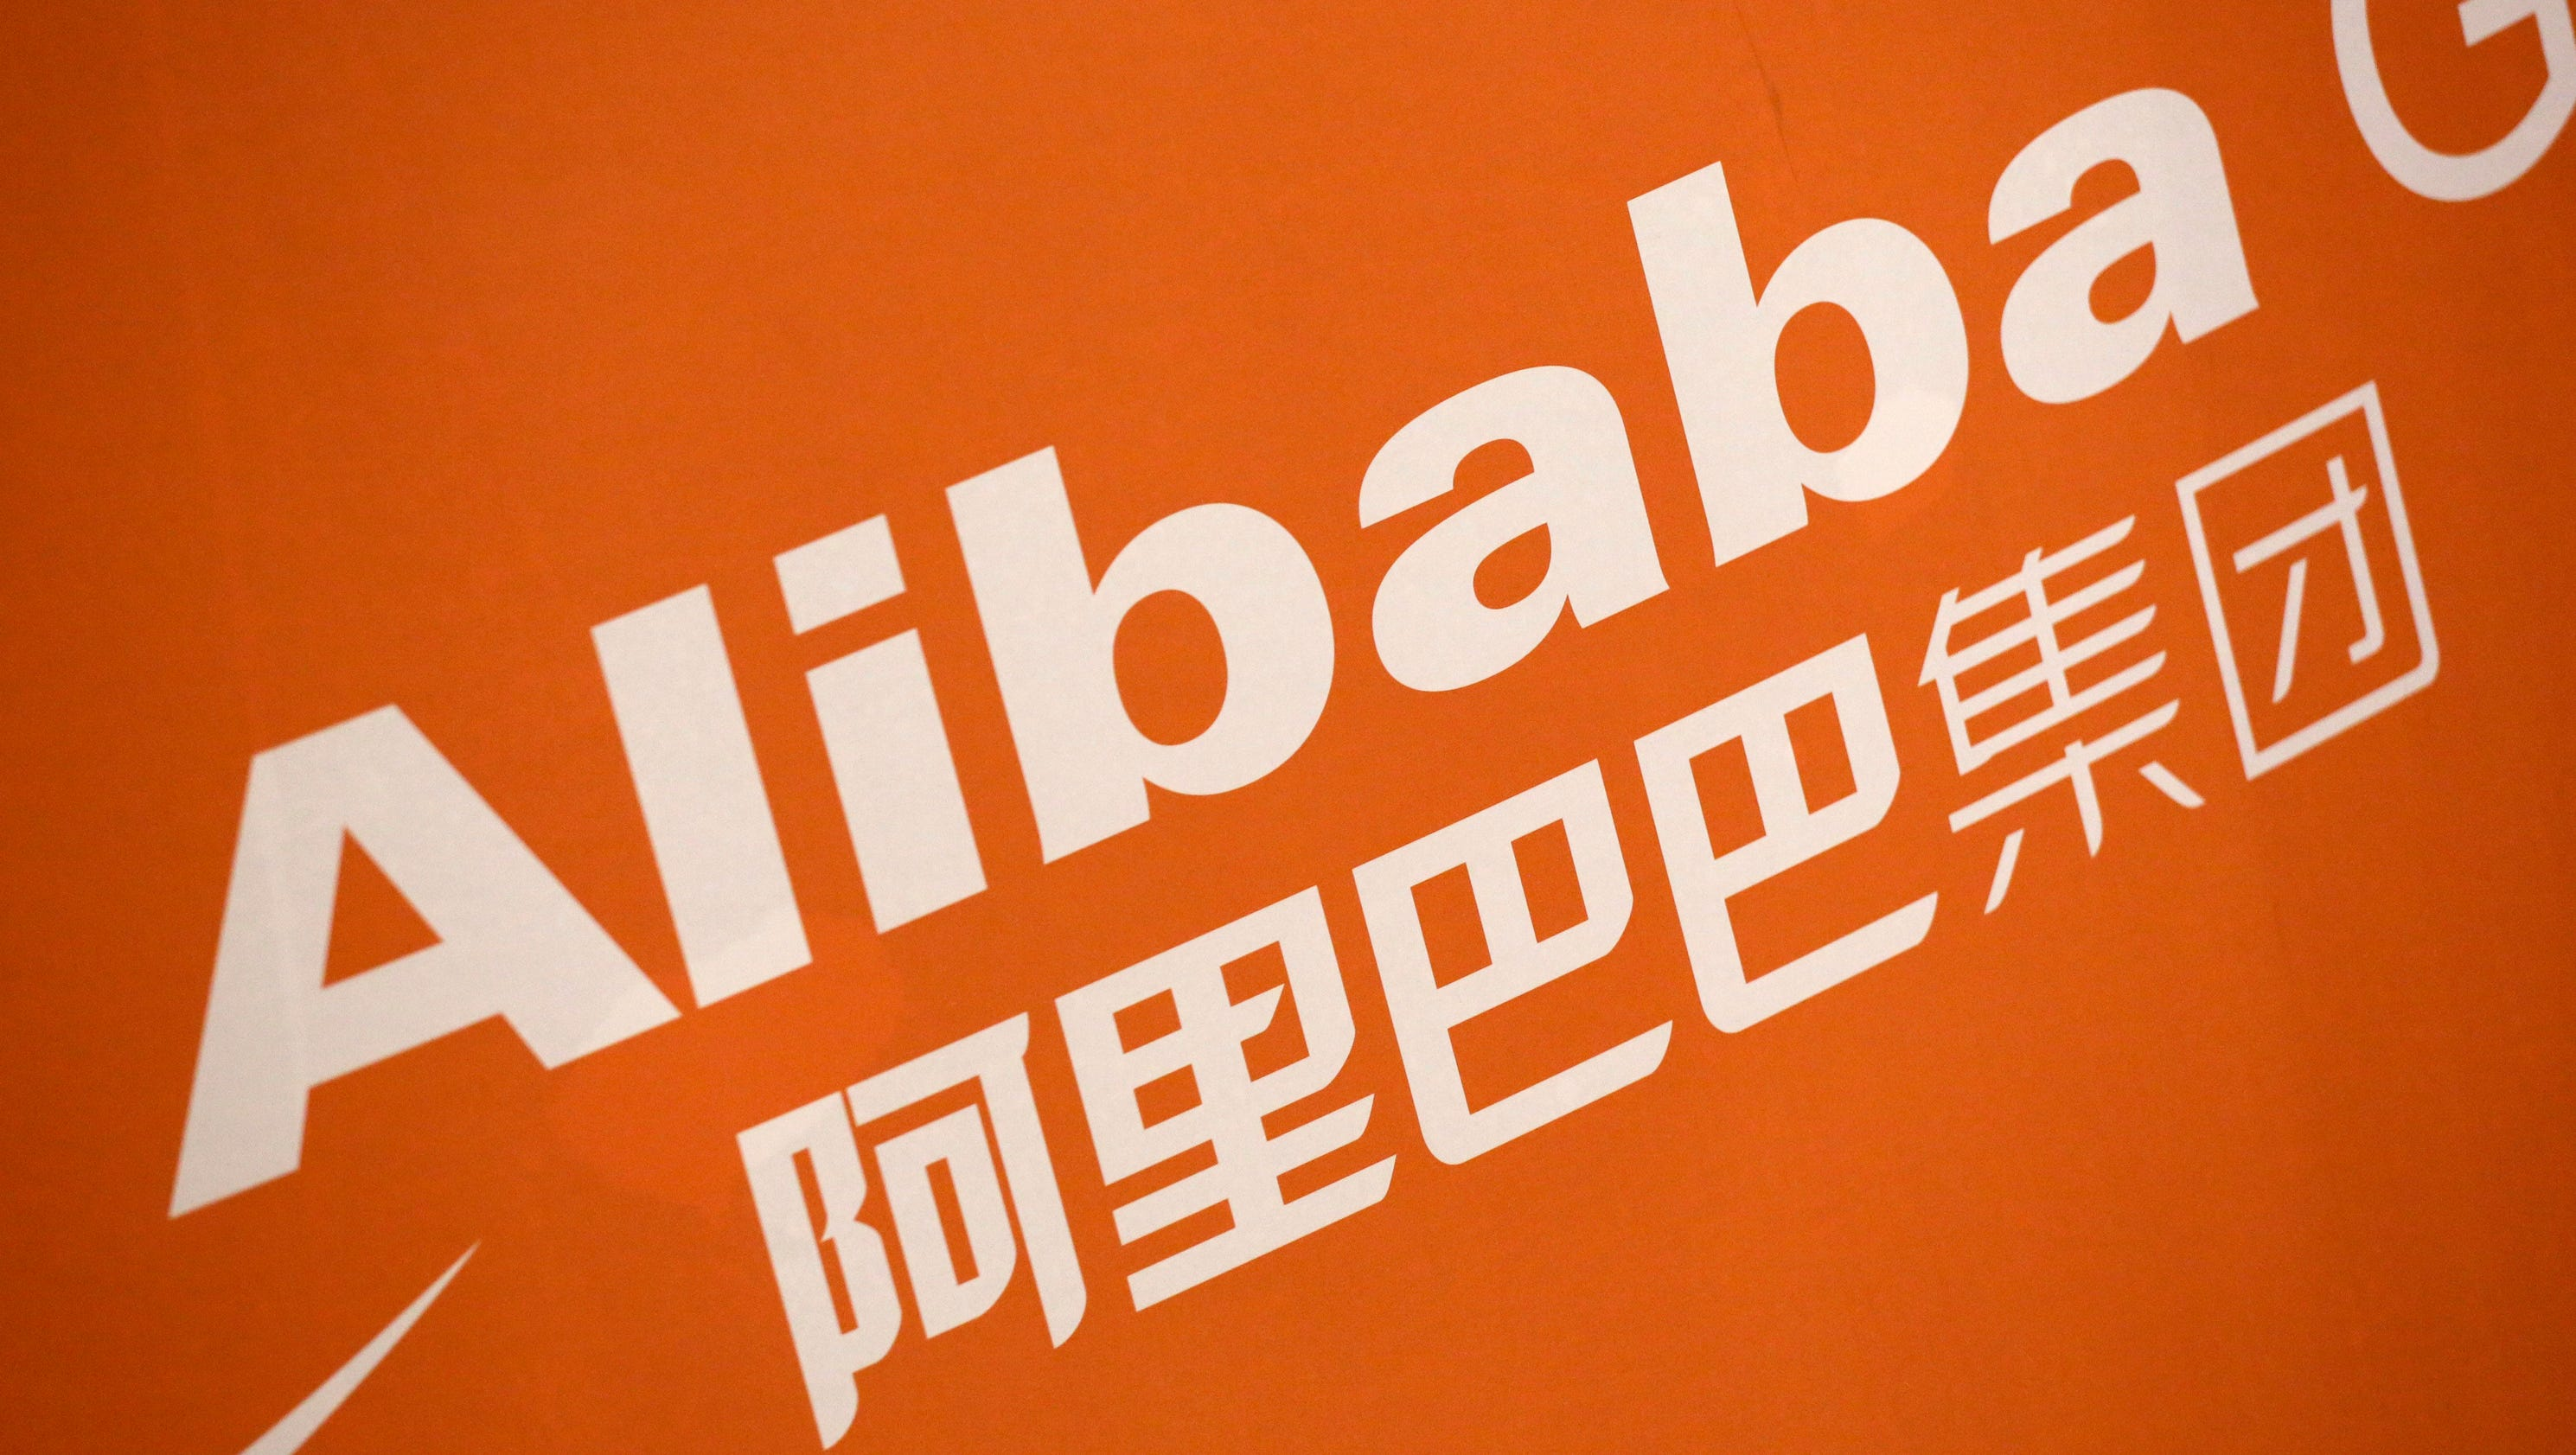 alibaba - photo #30